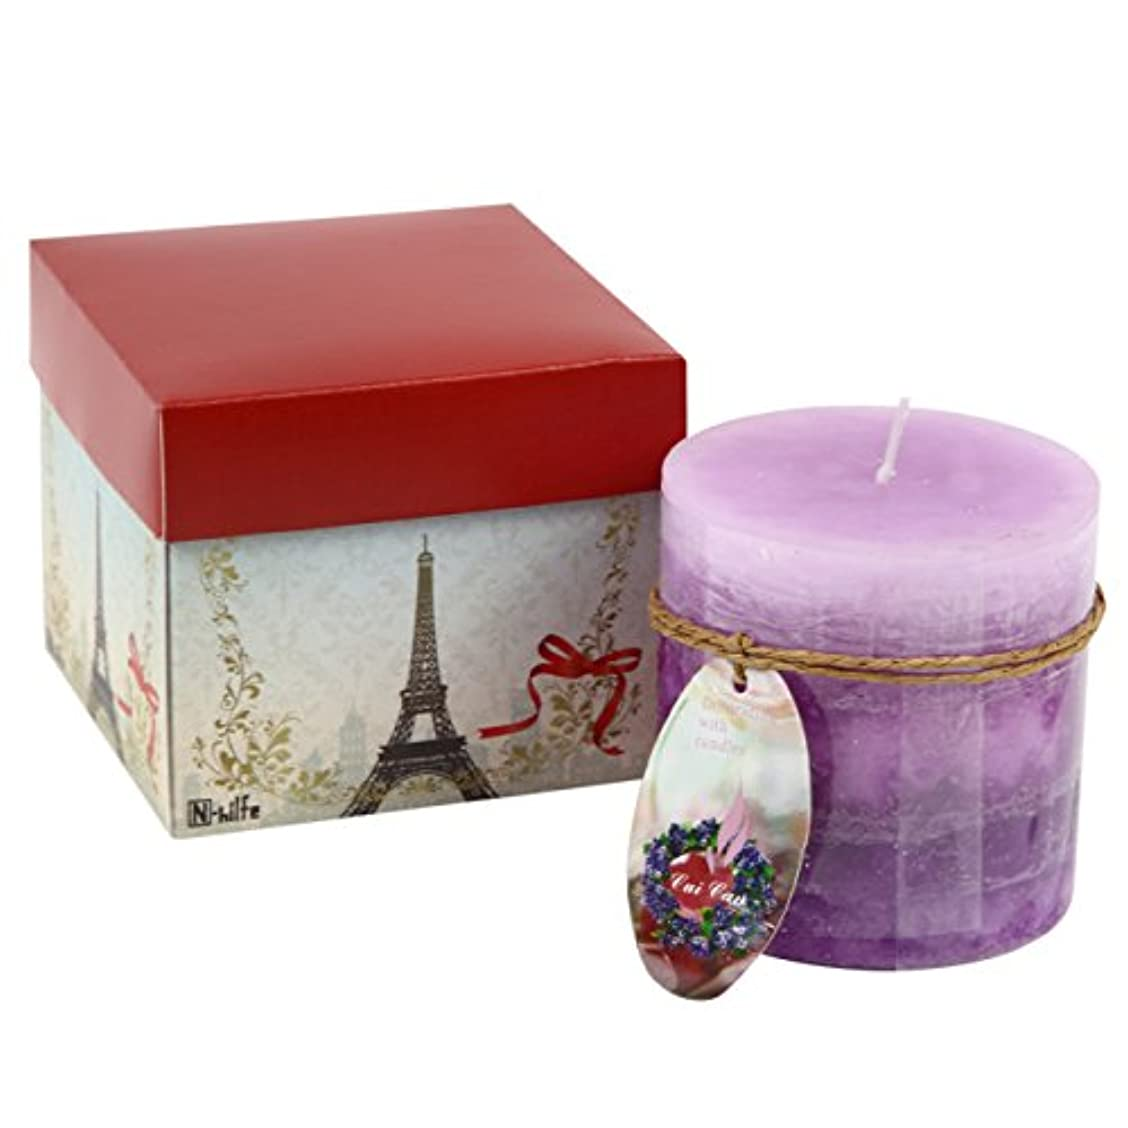 N-hilfe キャンドル 7.5x7.5cm 蝋燭 アロマキャンドル (パープル,紫)